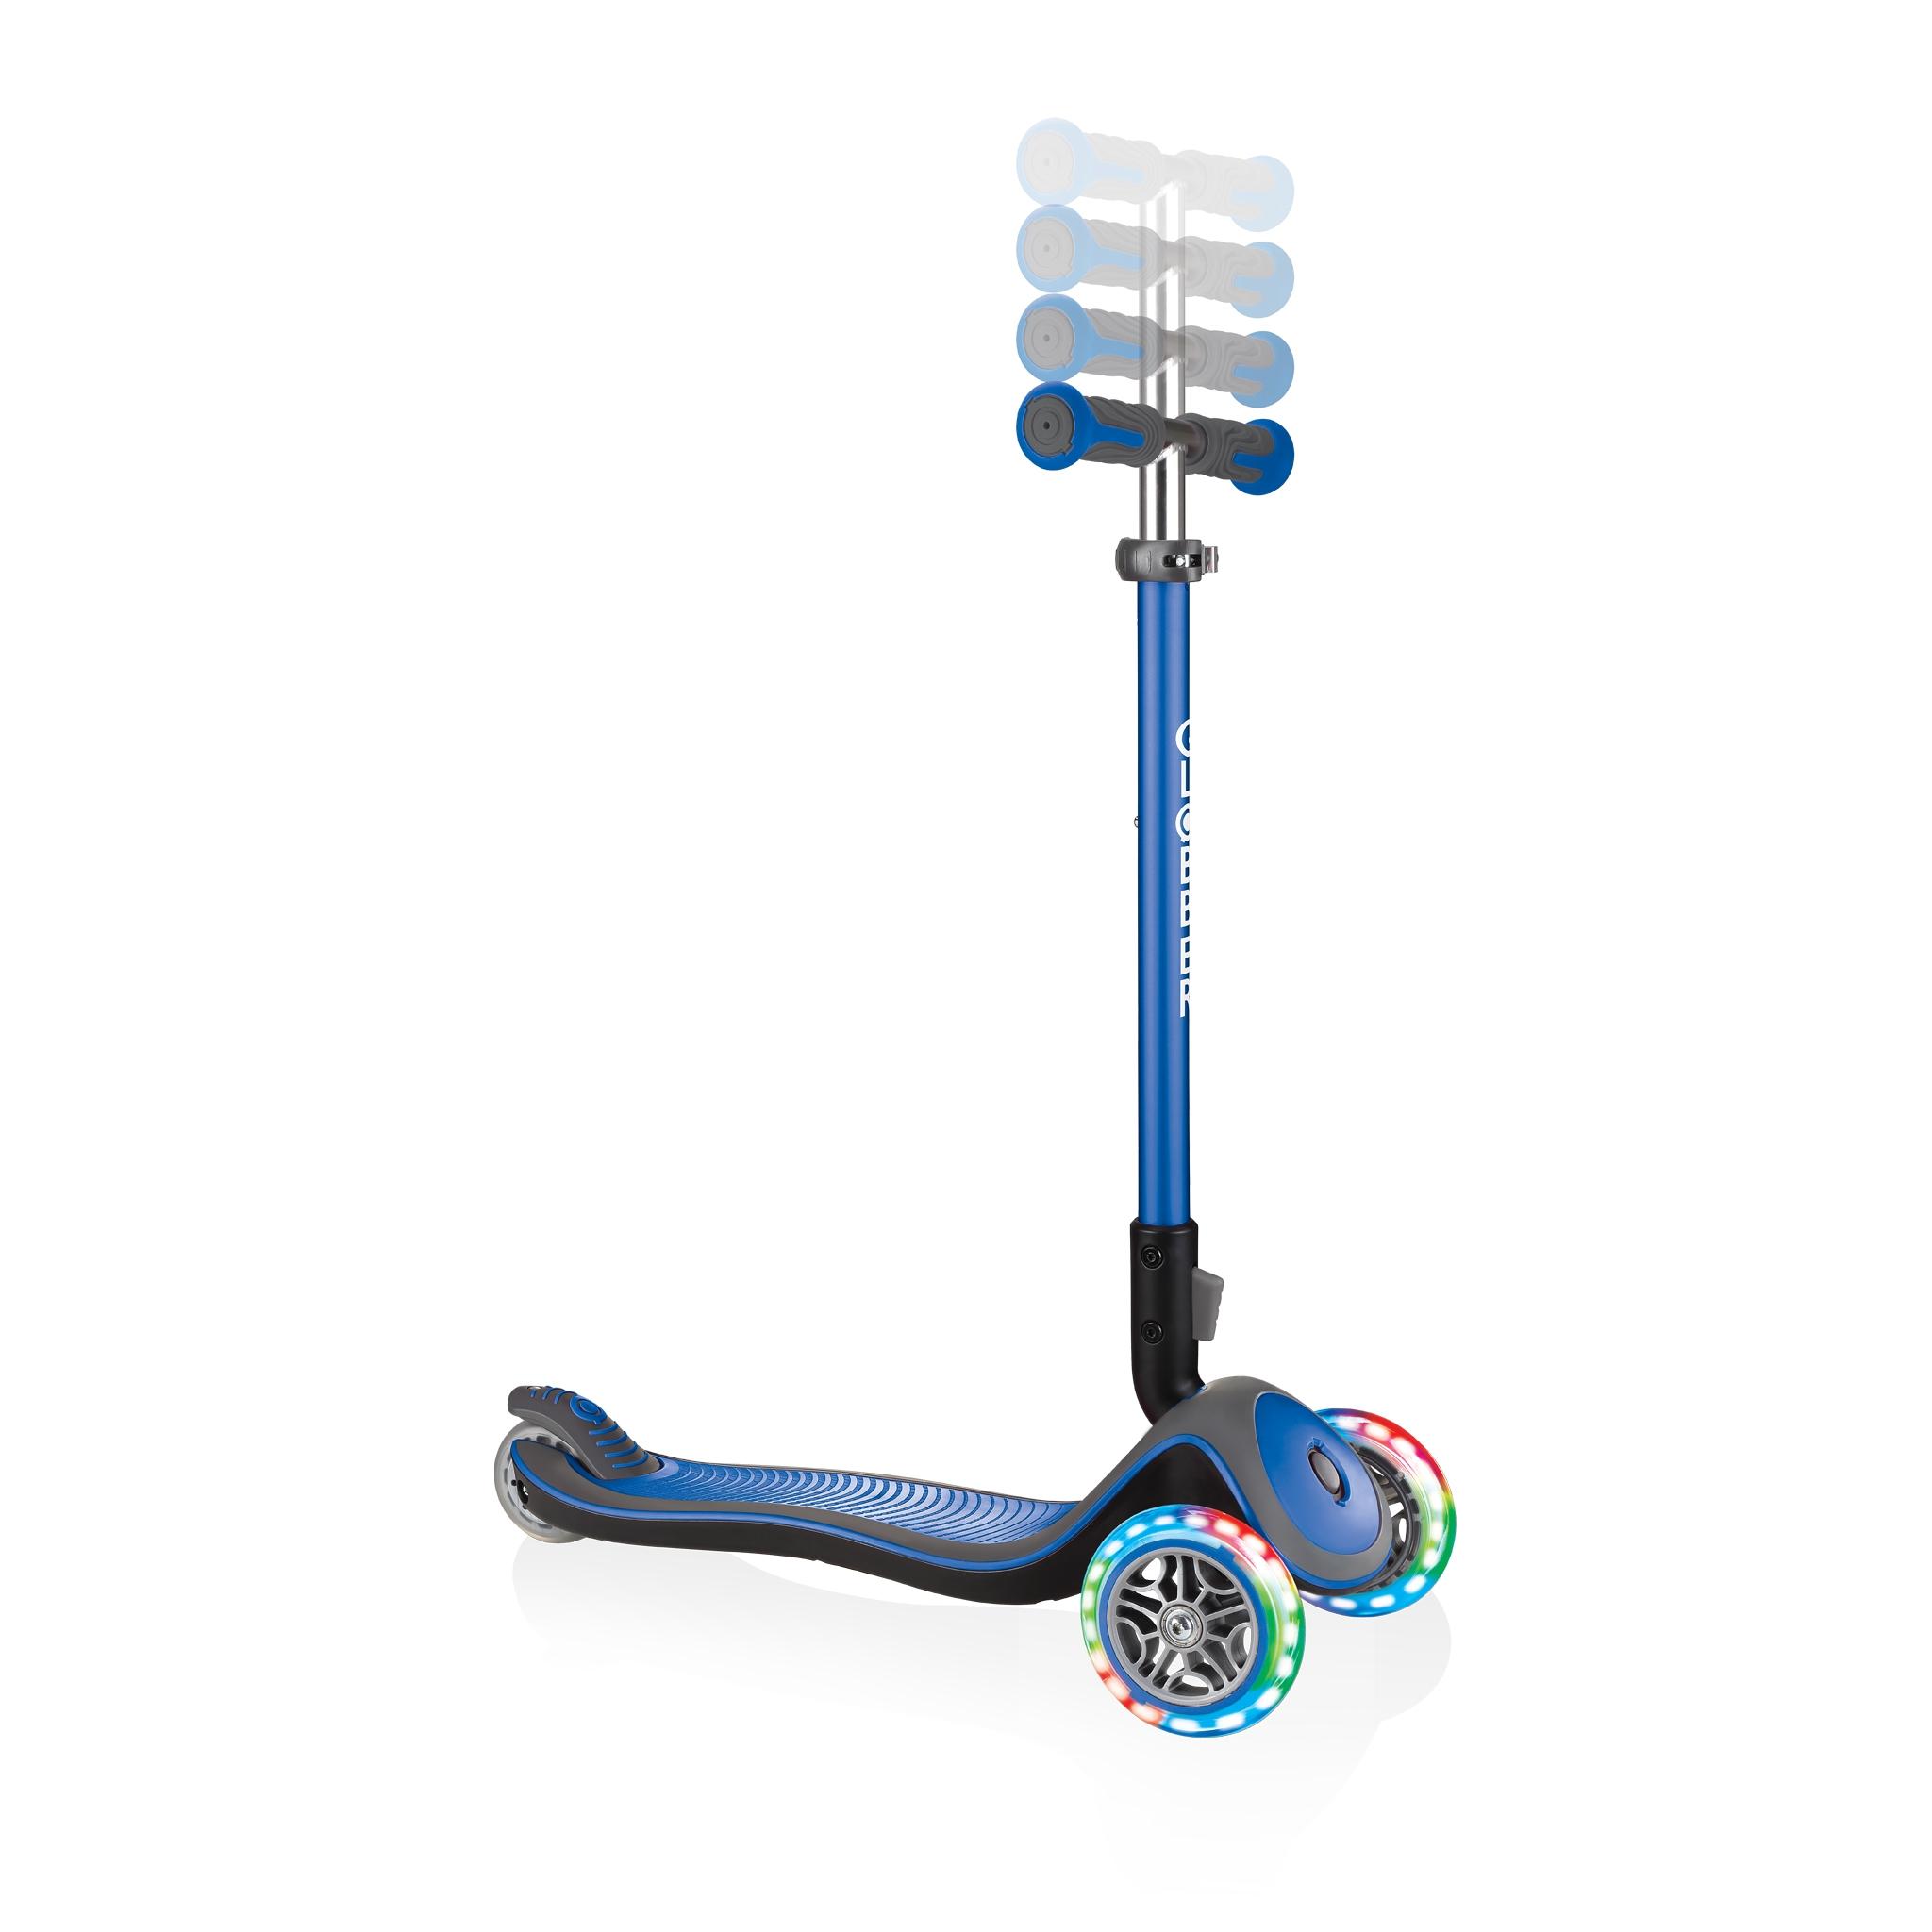 Globber-ELITE-DELUXE-LIGHTS-3-wheel-adjustable-scooter-for-kids-with-light-up-scooter-wheels-navy-blue 1